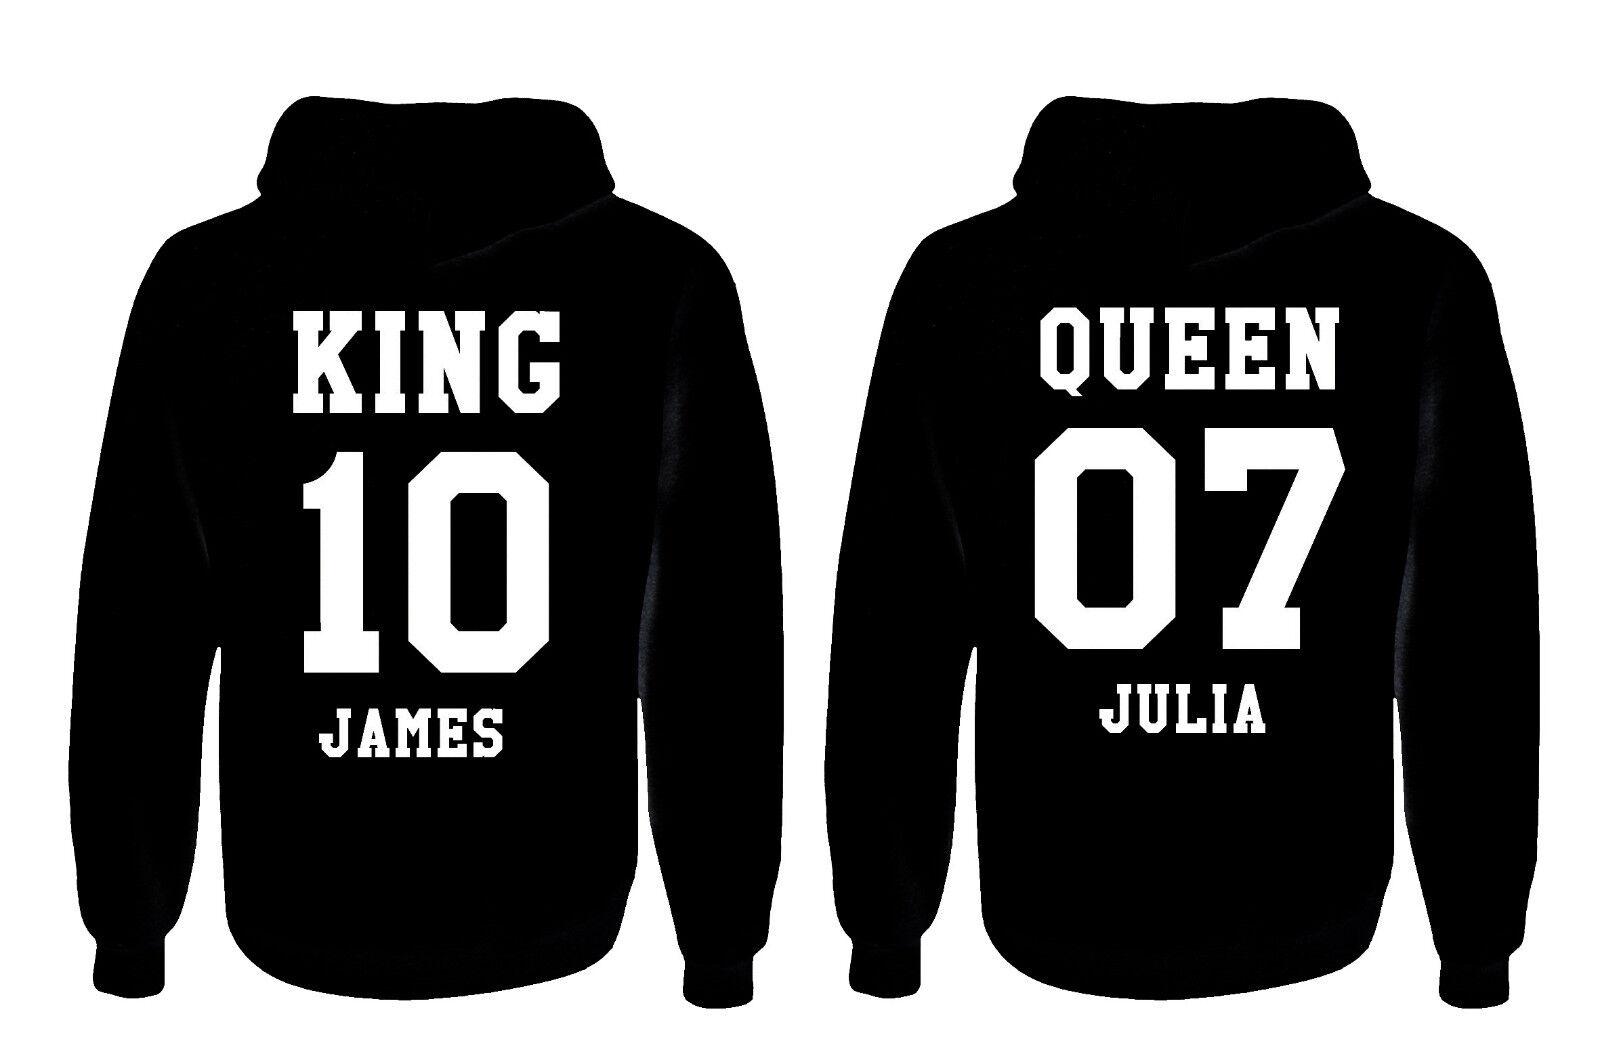 King Queen Partner Hoodie Sweatshirt 2 Stk. Christmas Weihnachtsgeschenk NEU